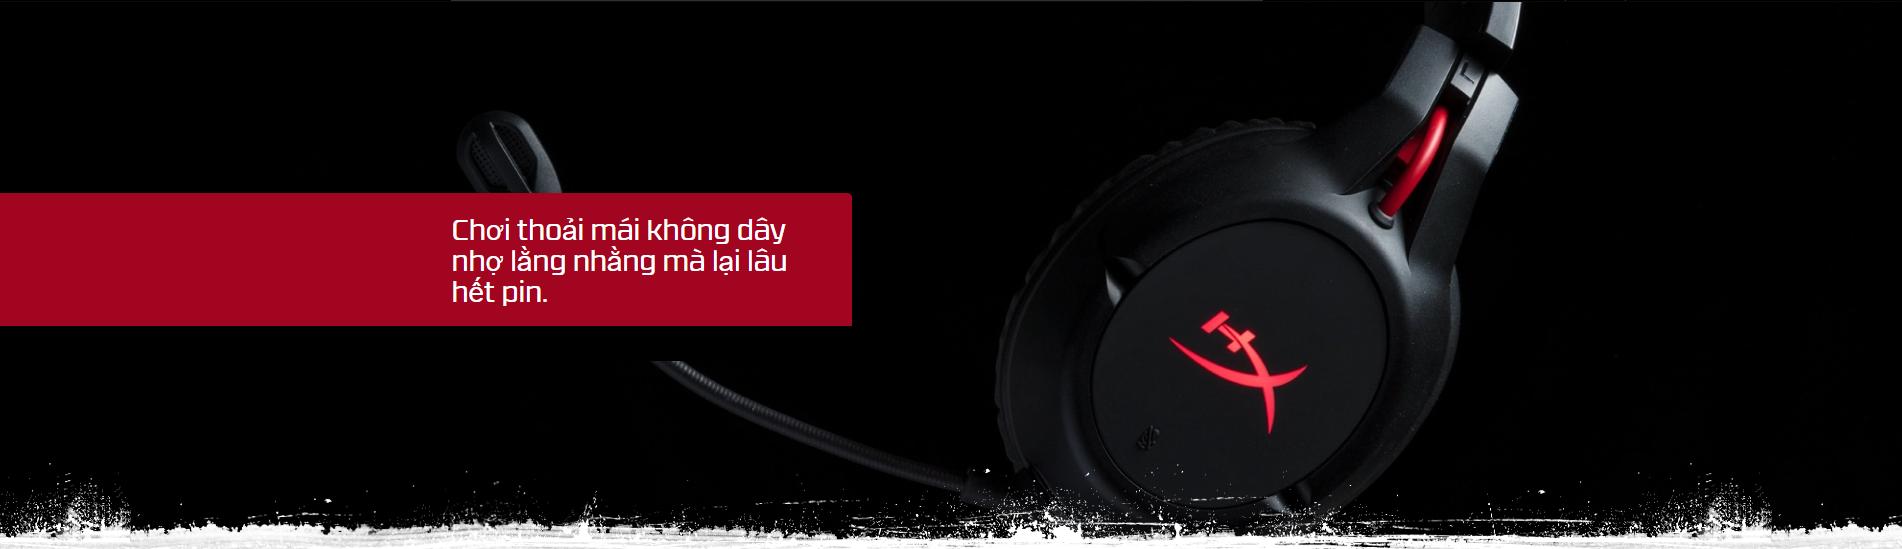 Giới thiệu Tai nghe Kingston HyperX CLOUD FLIGHT WIRELESS Black - HX-HSCF-BK/AM